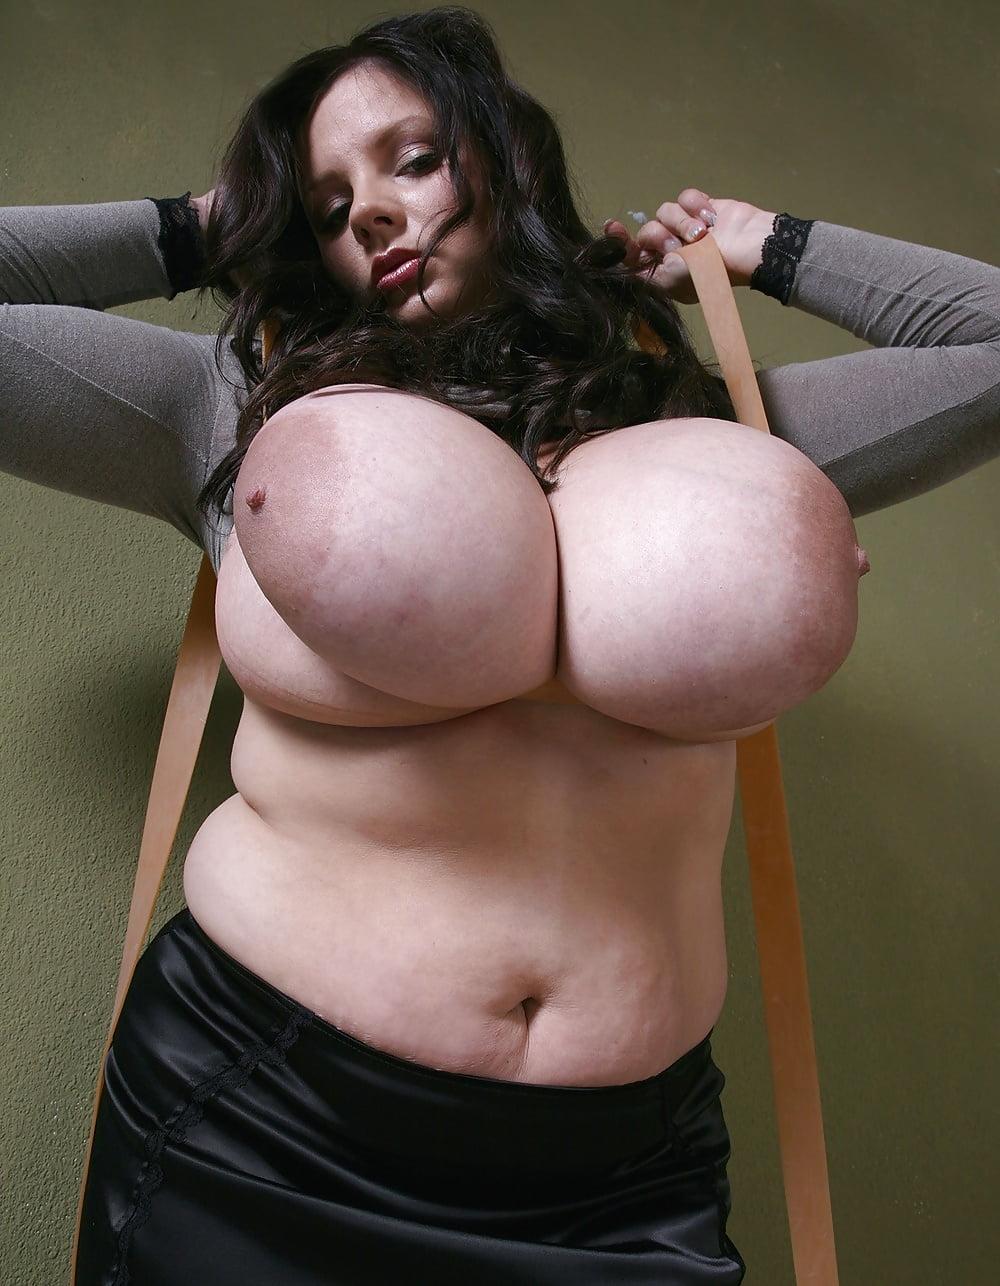 Big tits tied up